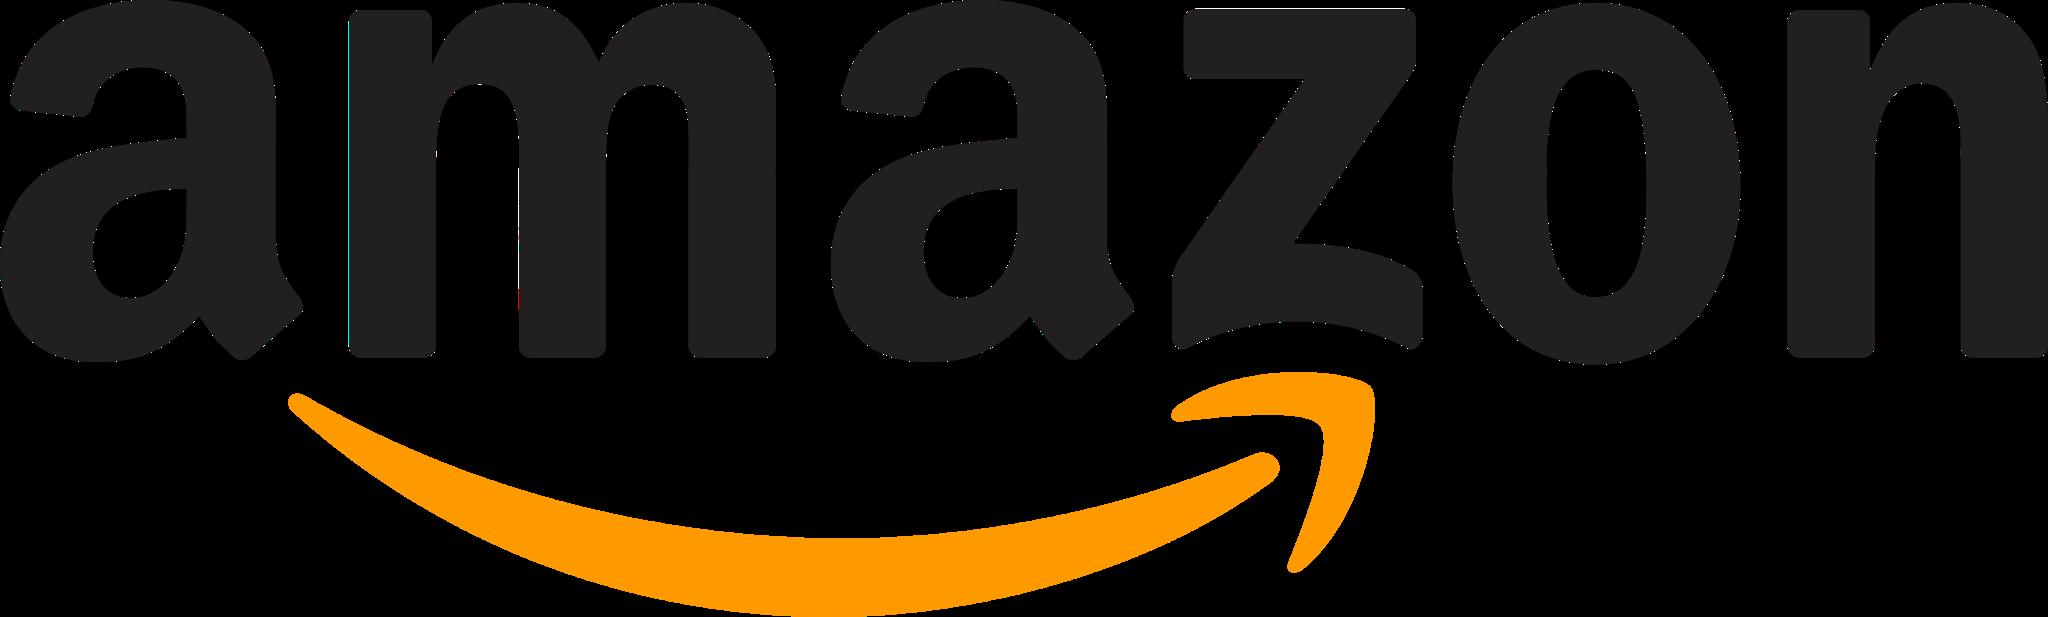 logotipo da empresa Amazon